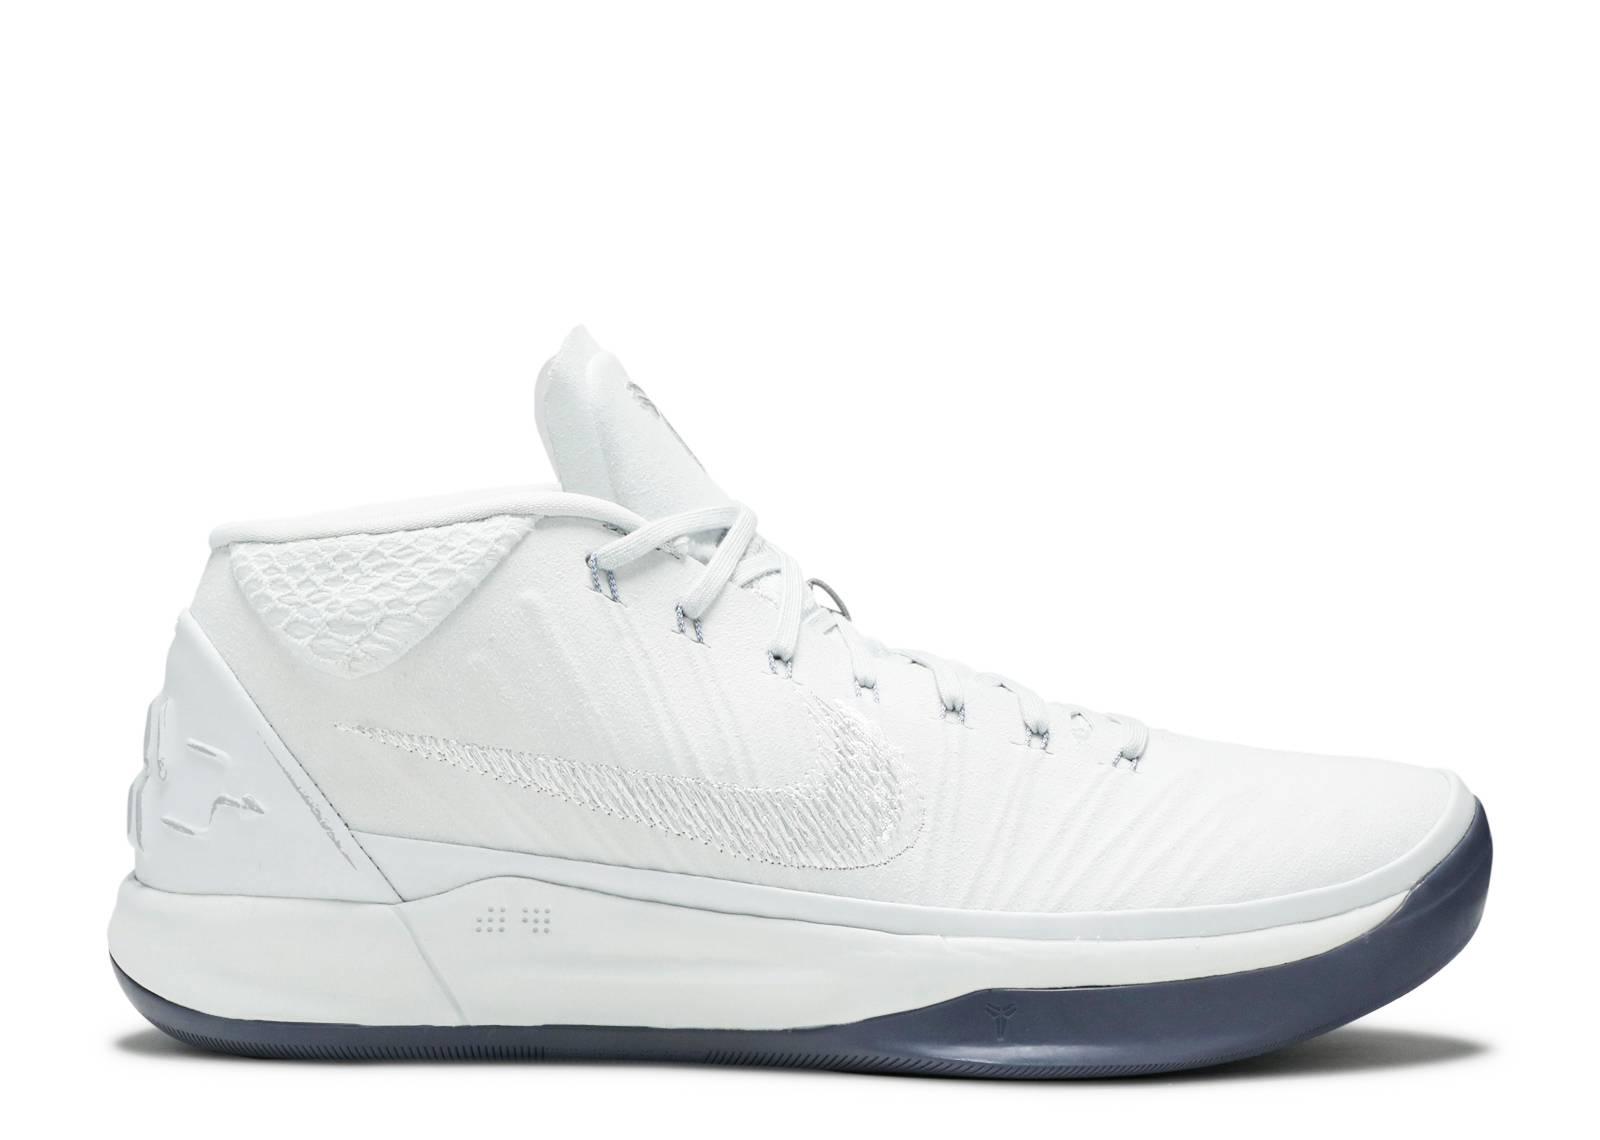 check out 5a05f 9cb73 Kobe Ad - Nike - 922482 004 - pure platinum white   Flight Club